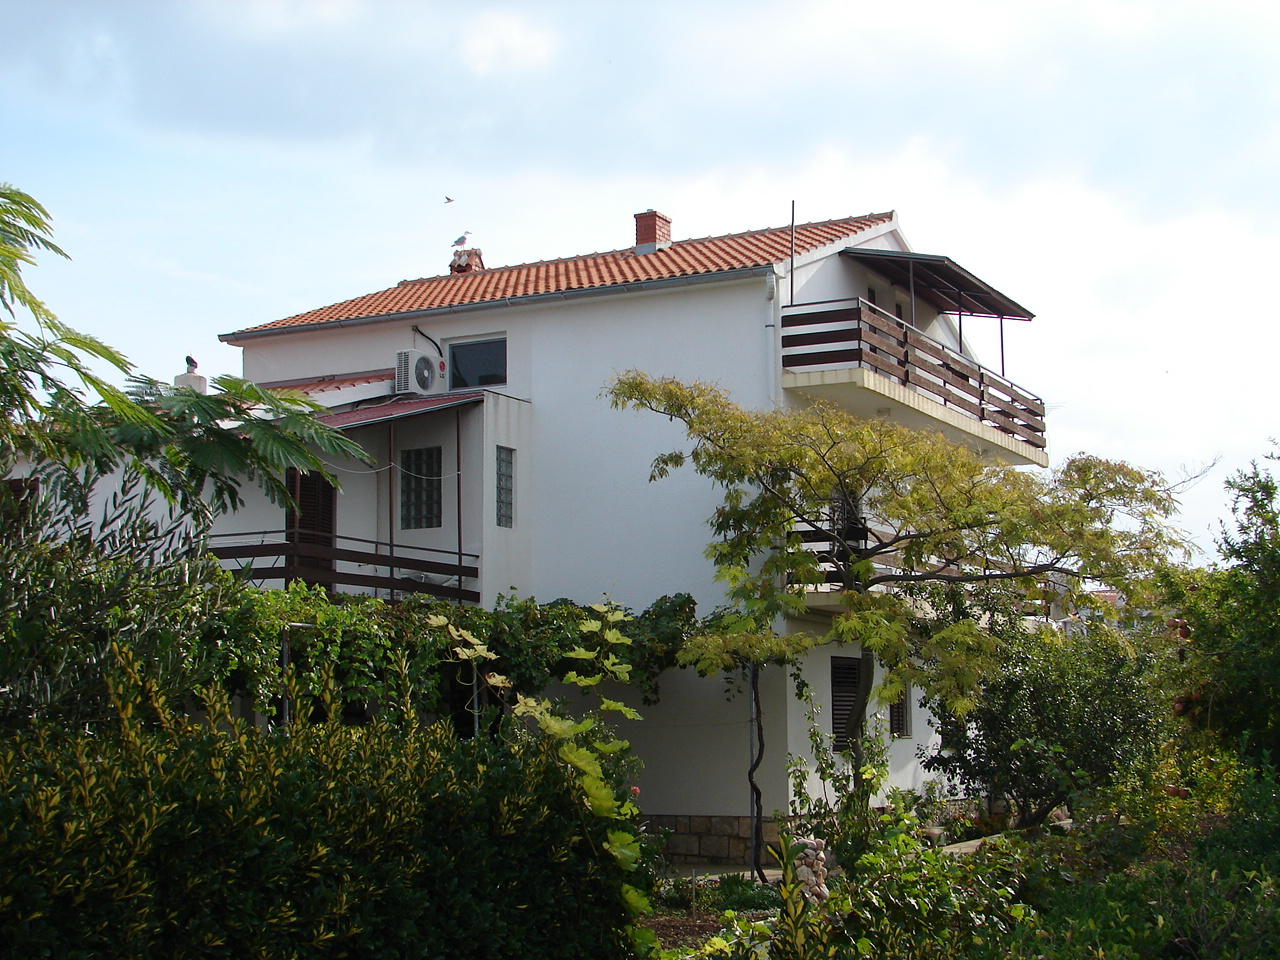 35179 - Betina - Apartments Croatia